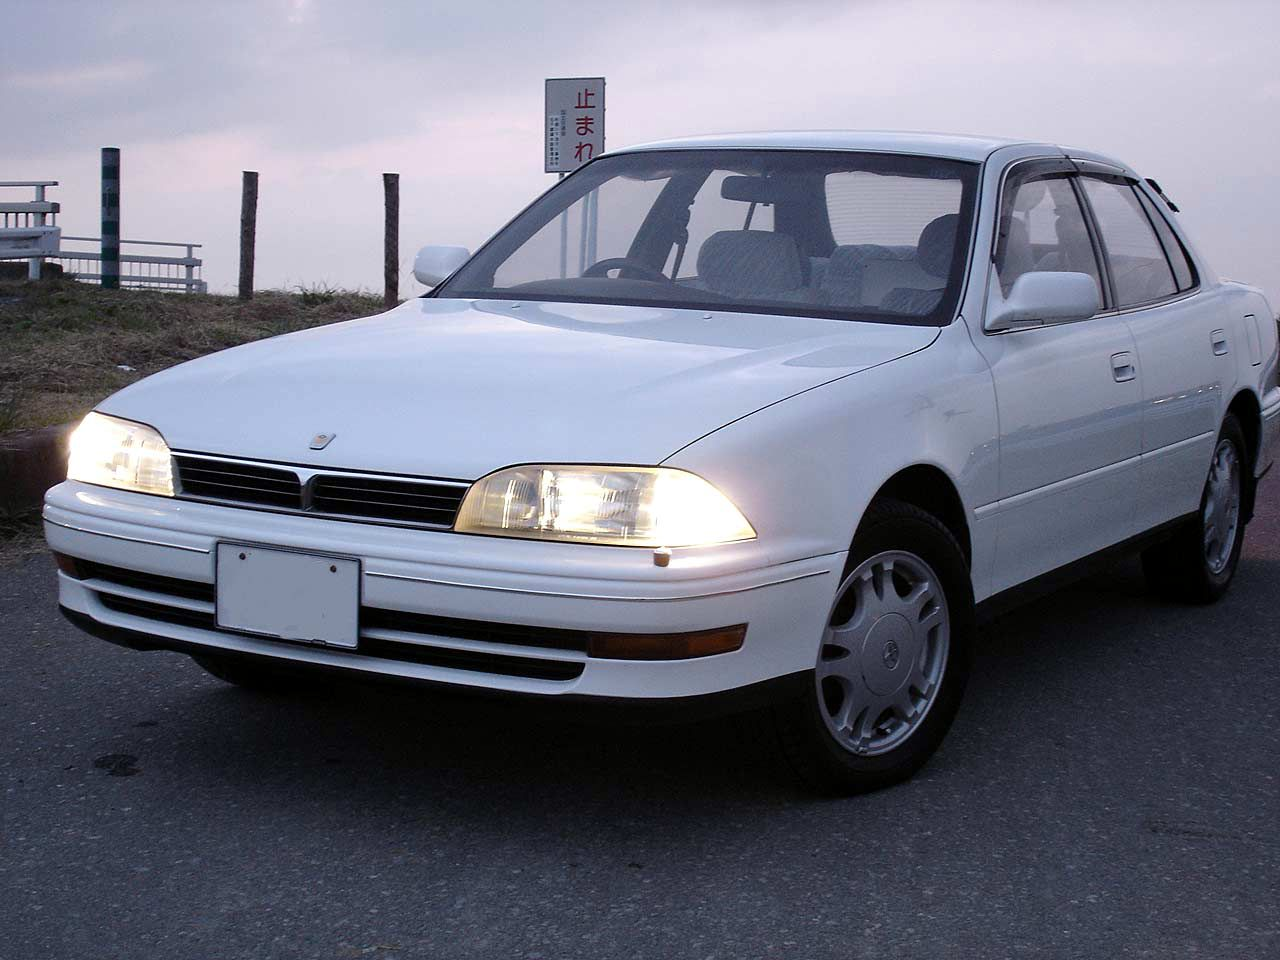 Toyota Camry (V30) | Classic Cars | Pinterest | Toyota camry ...